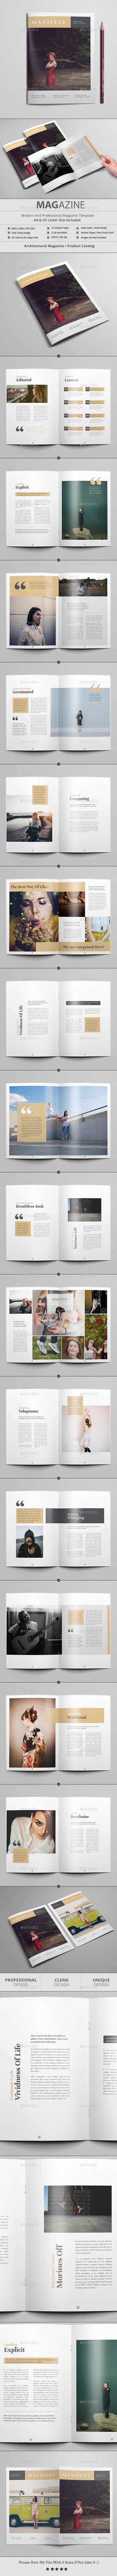 Manifest Magazine / Lookbook - Magazines Print Templates